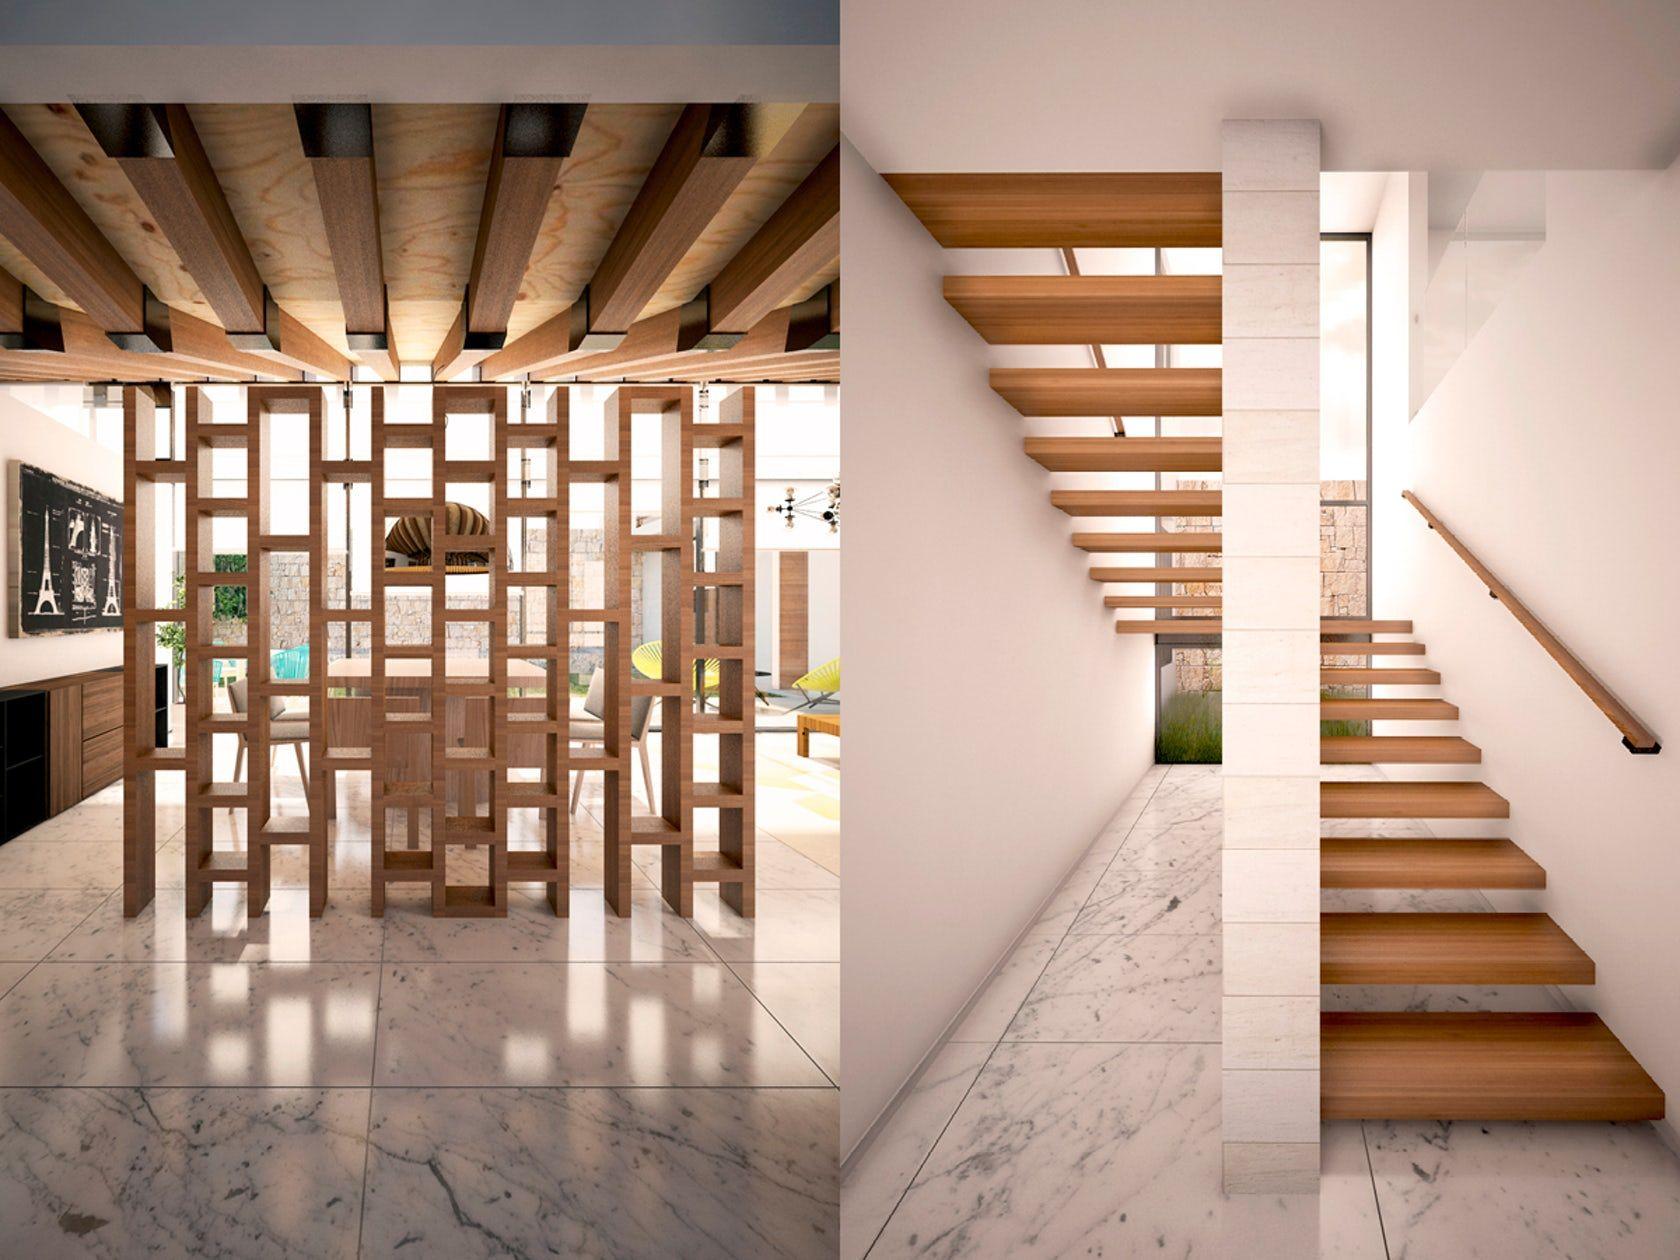 Detalle Celosia Escalera Madera Vigas De Madera Home Decor Home Decor